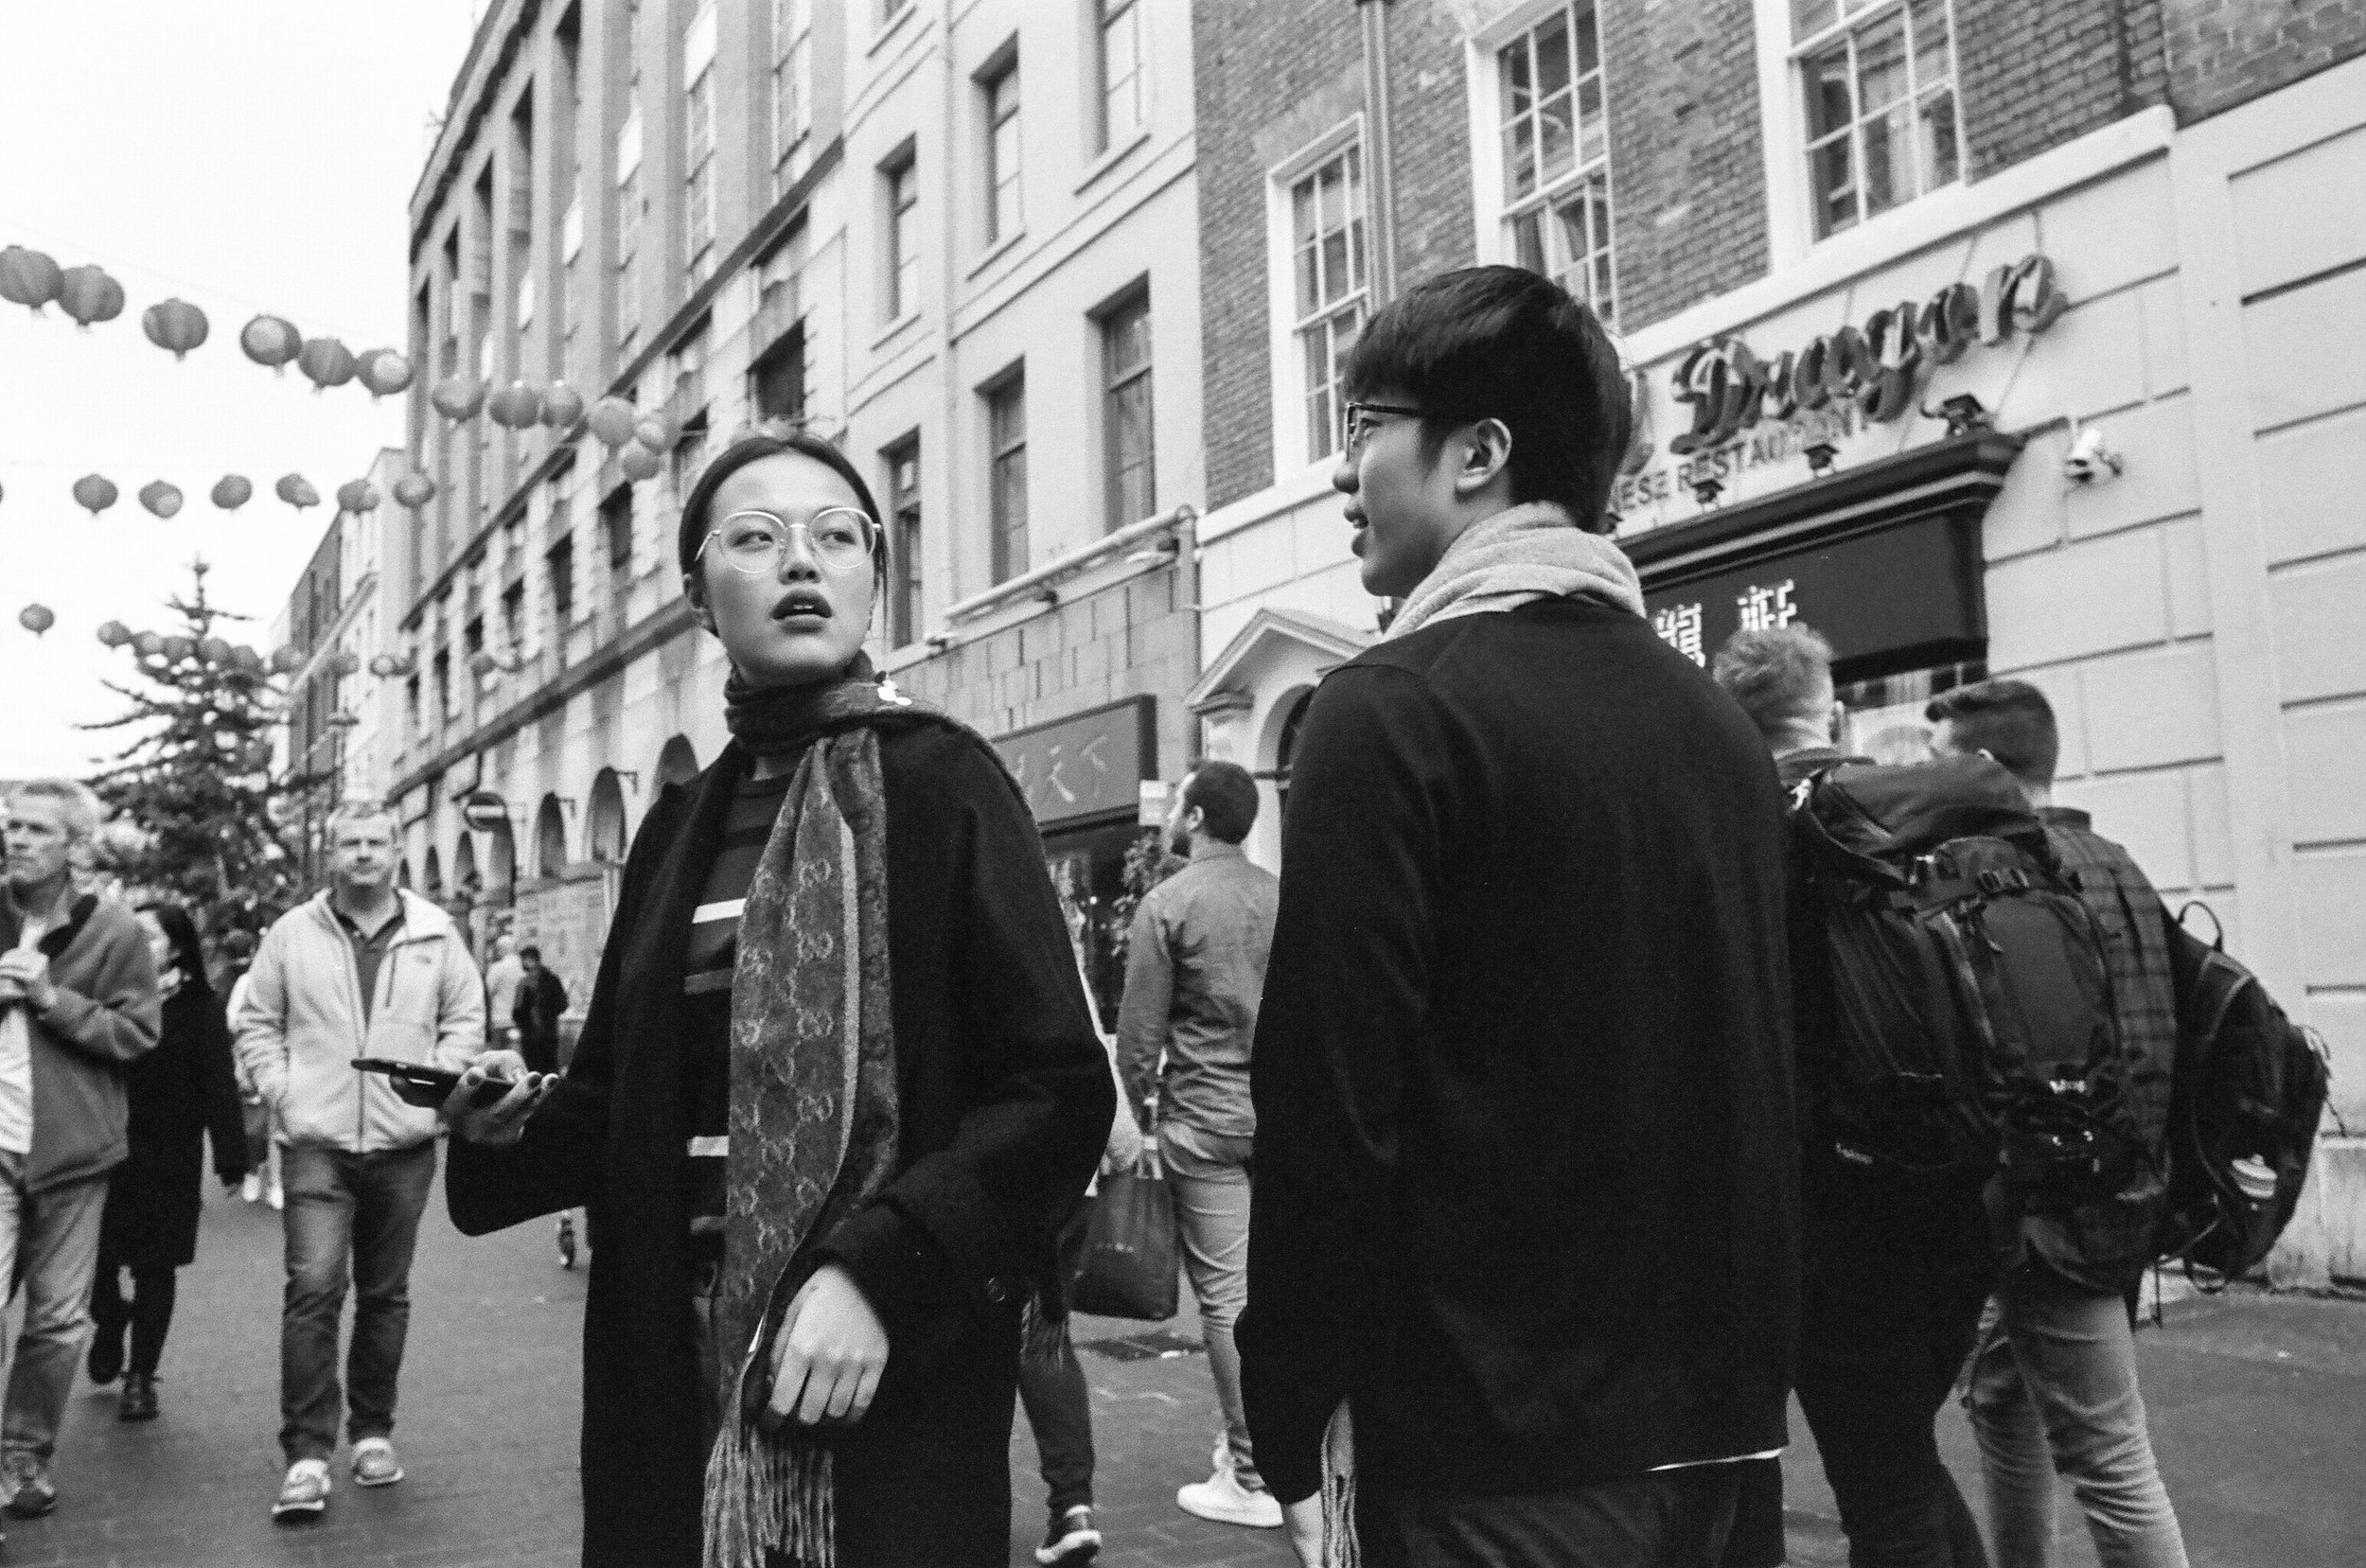 Soho, London - Clifford Darby 2017